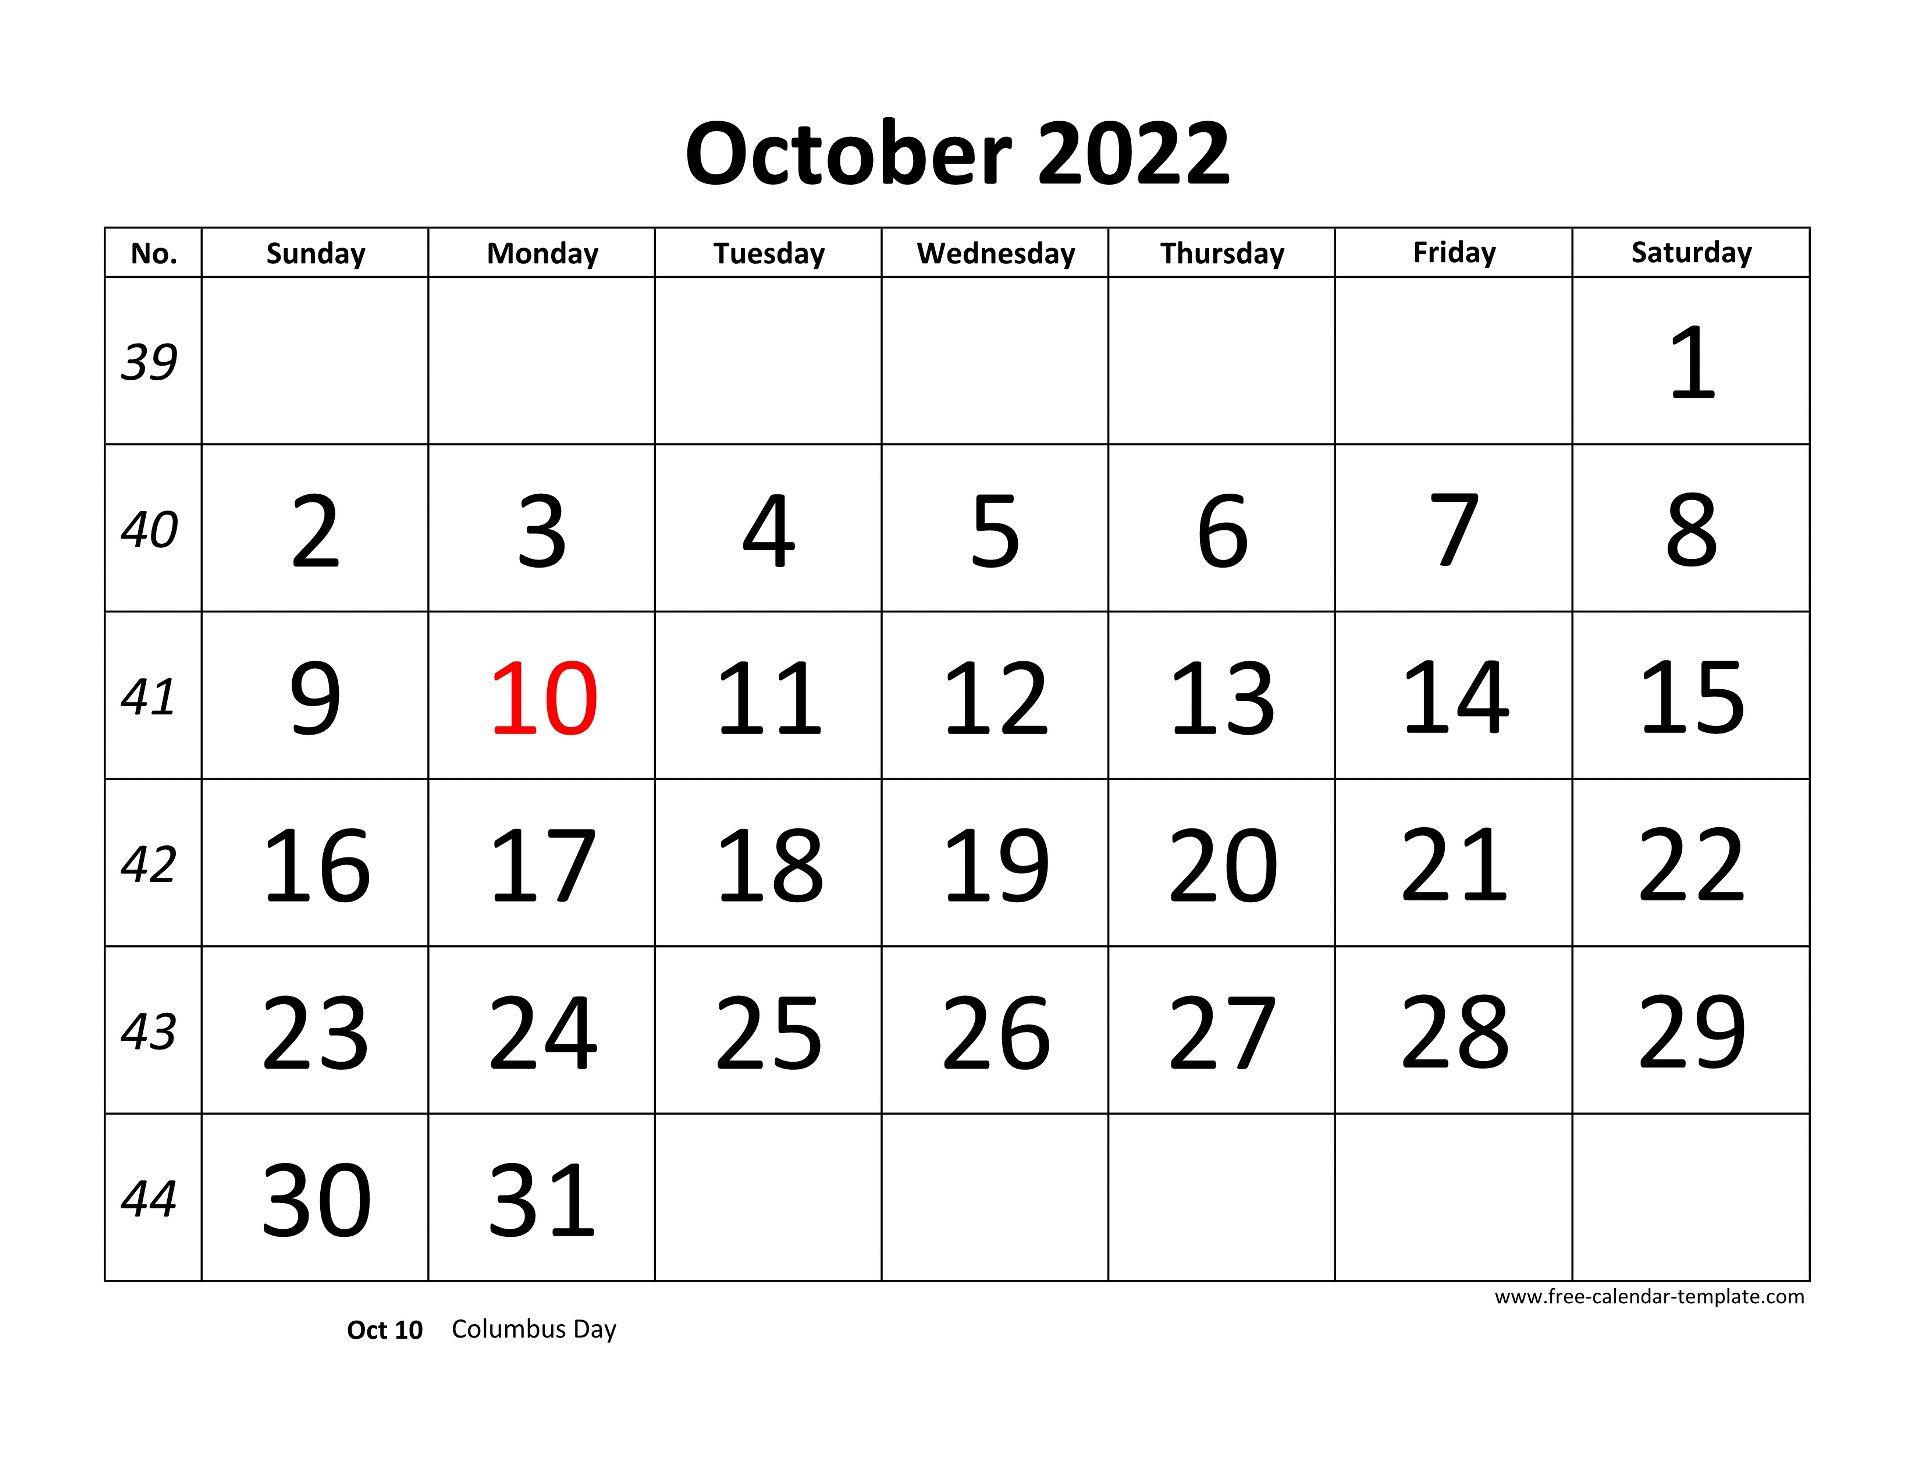 October 2022 Calendar.October 2022 Calendar Designed With Large Font Horizontal Free Calendar Template Com